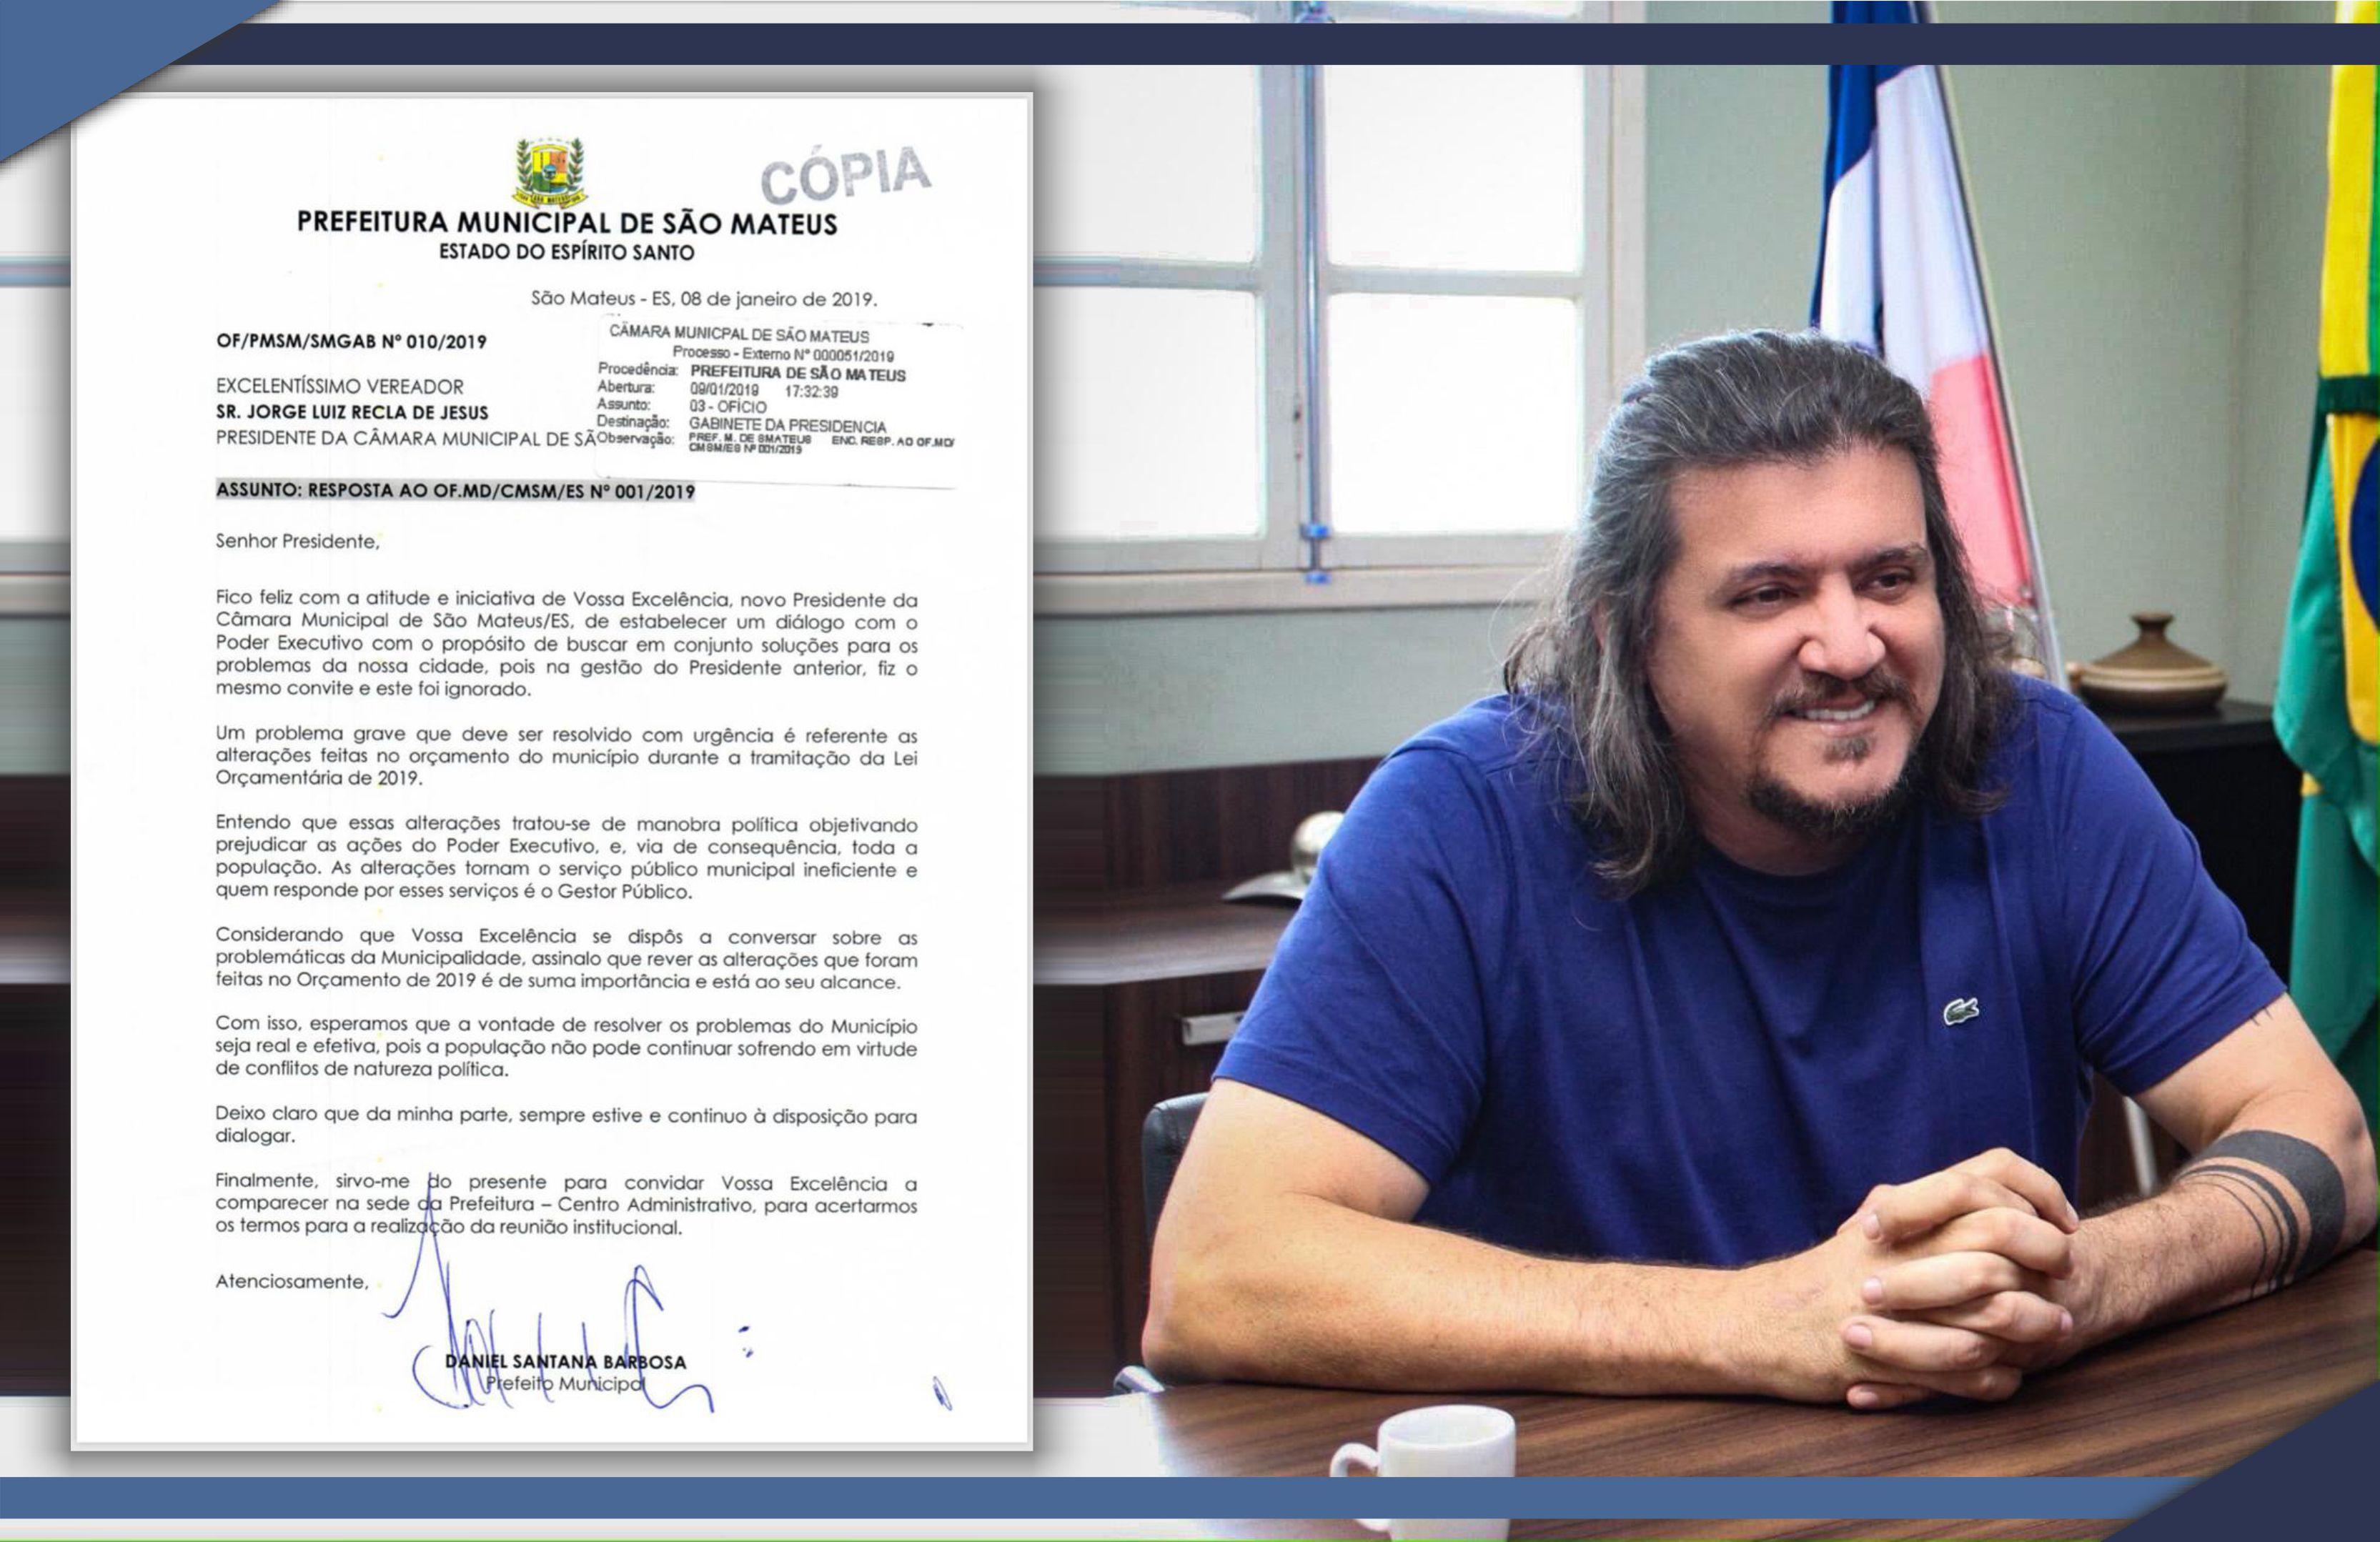 Prefeito Daniel Santana responde convite do Presidente da Câmara Municipal de Vereadores